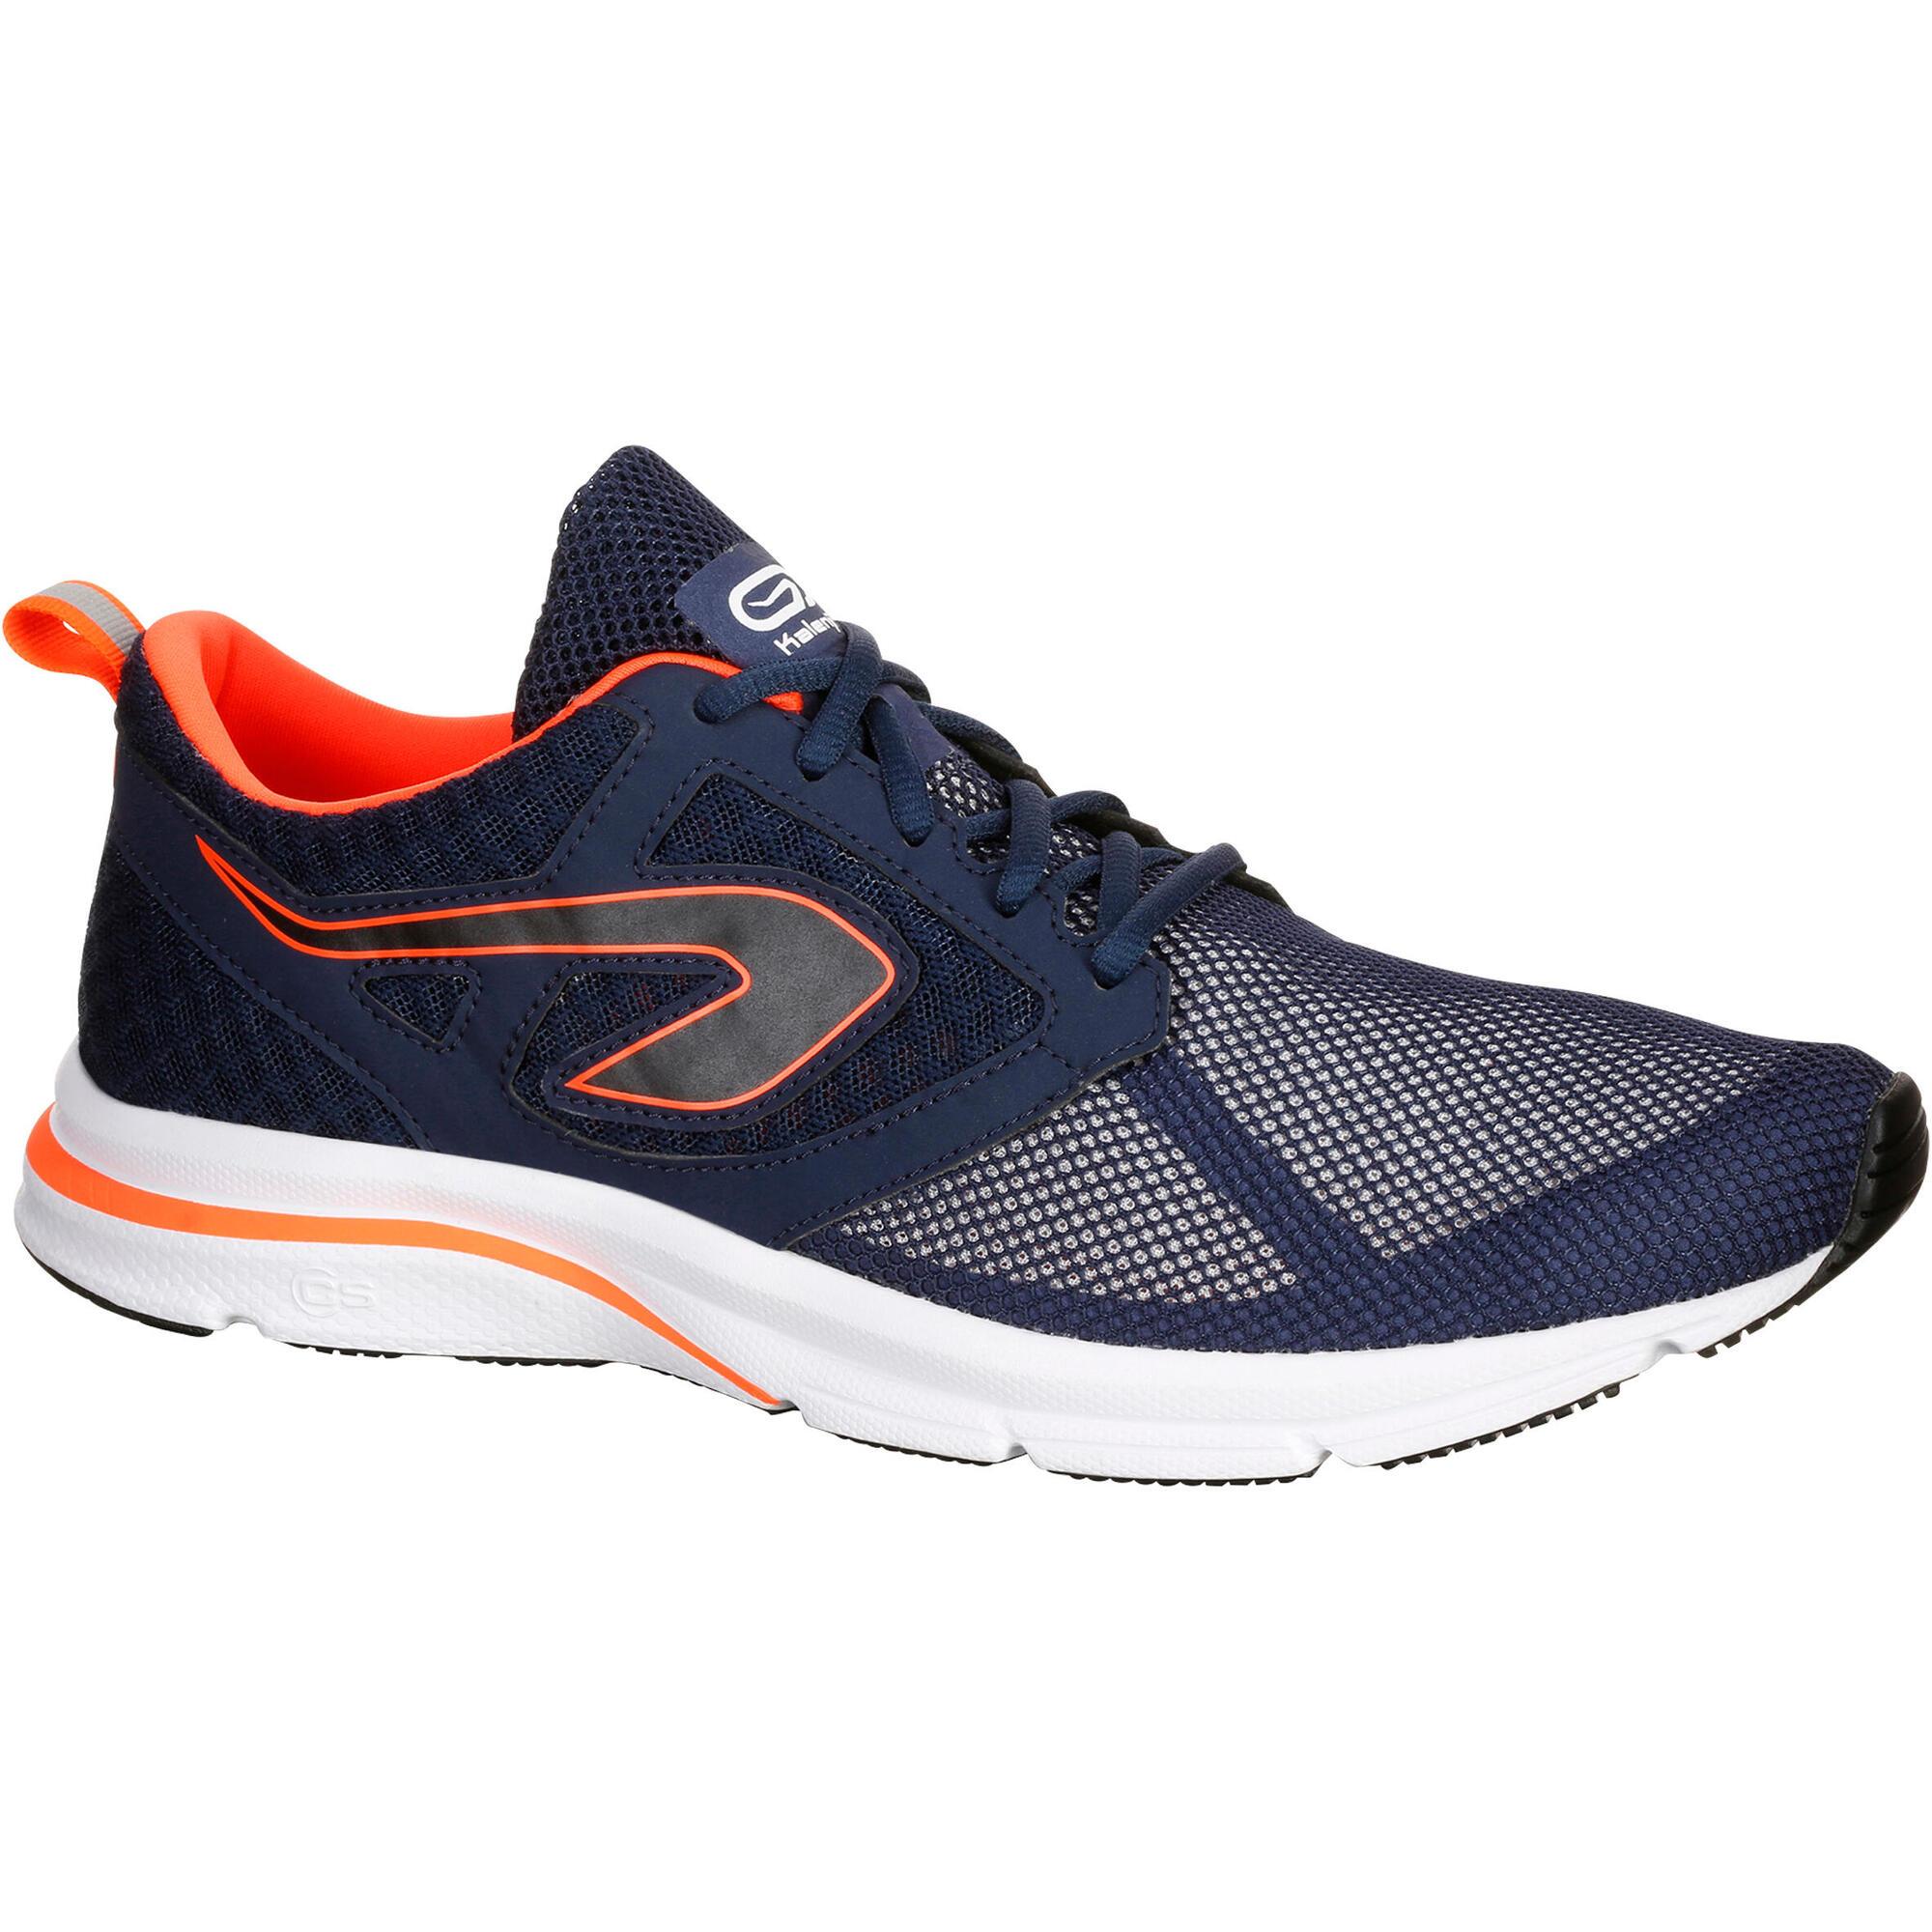 chaussures course à pied homme asics